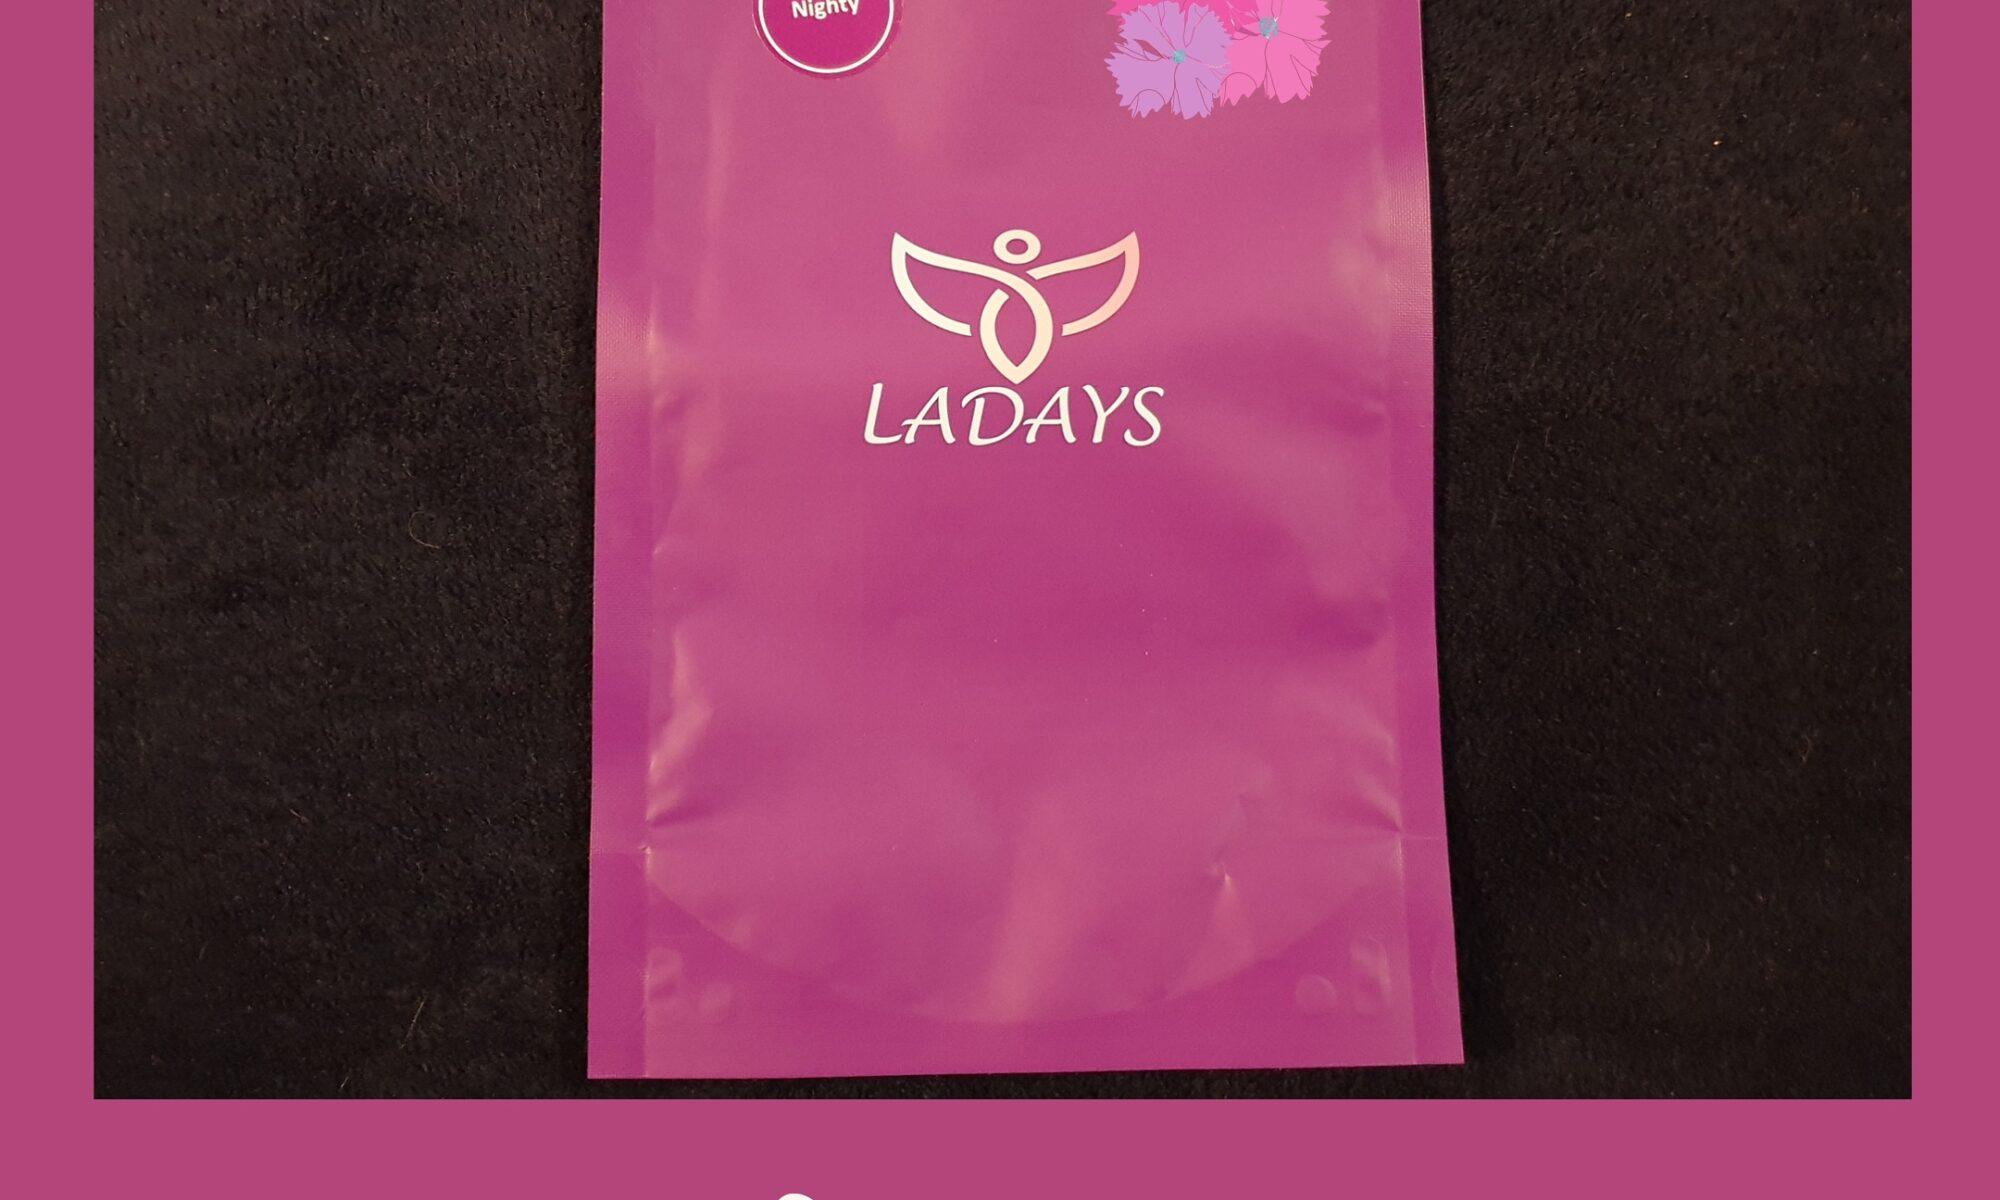 Test culottes menstruelles ladays